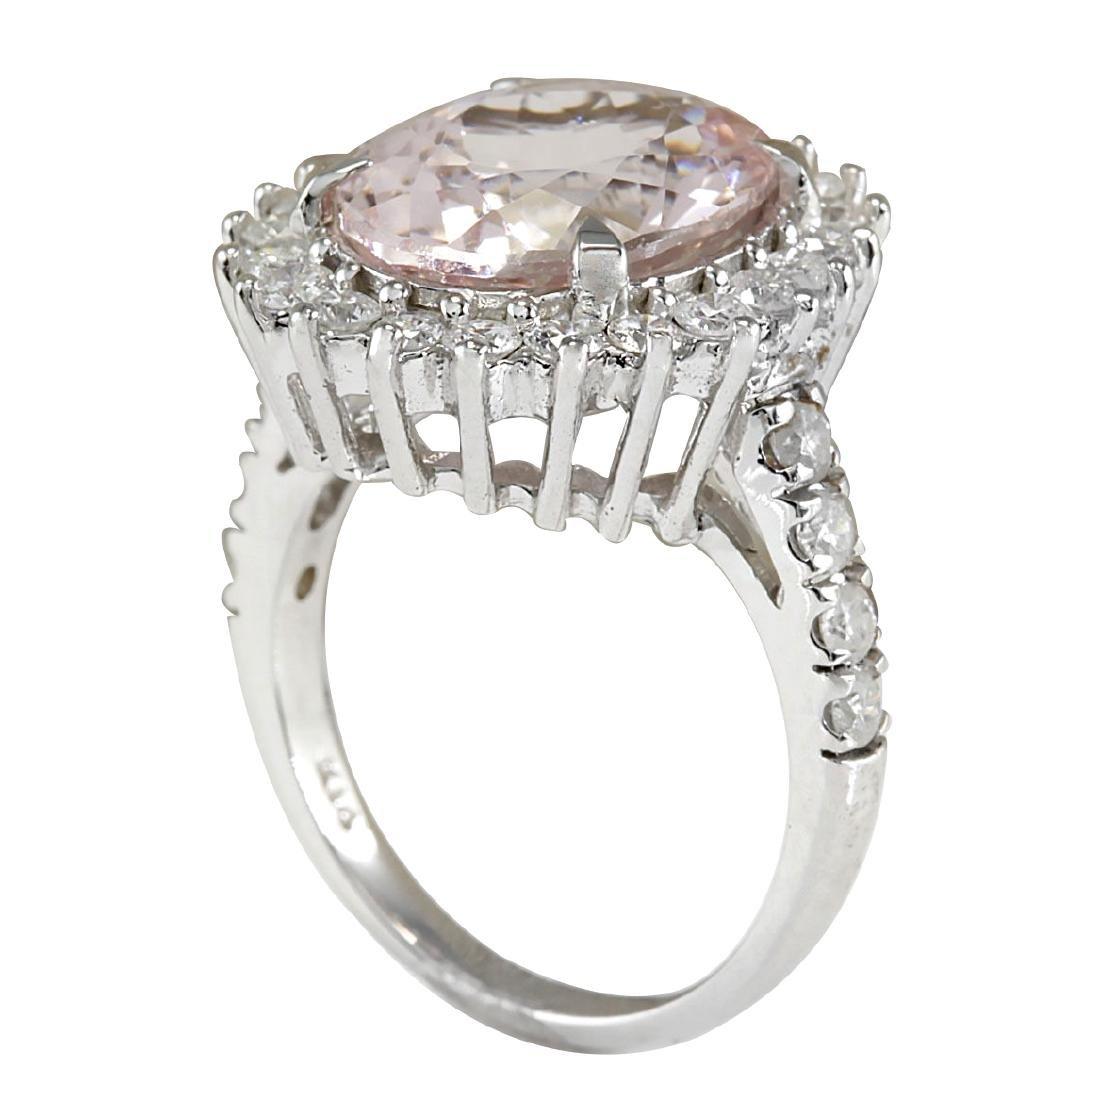 7.34CTW Natural Morganite And Diamond Ring In 18K White - 3